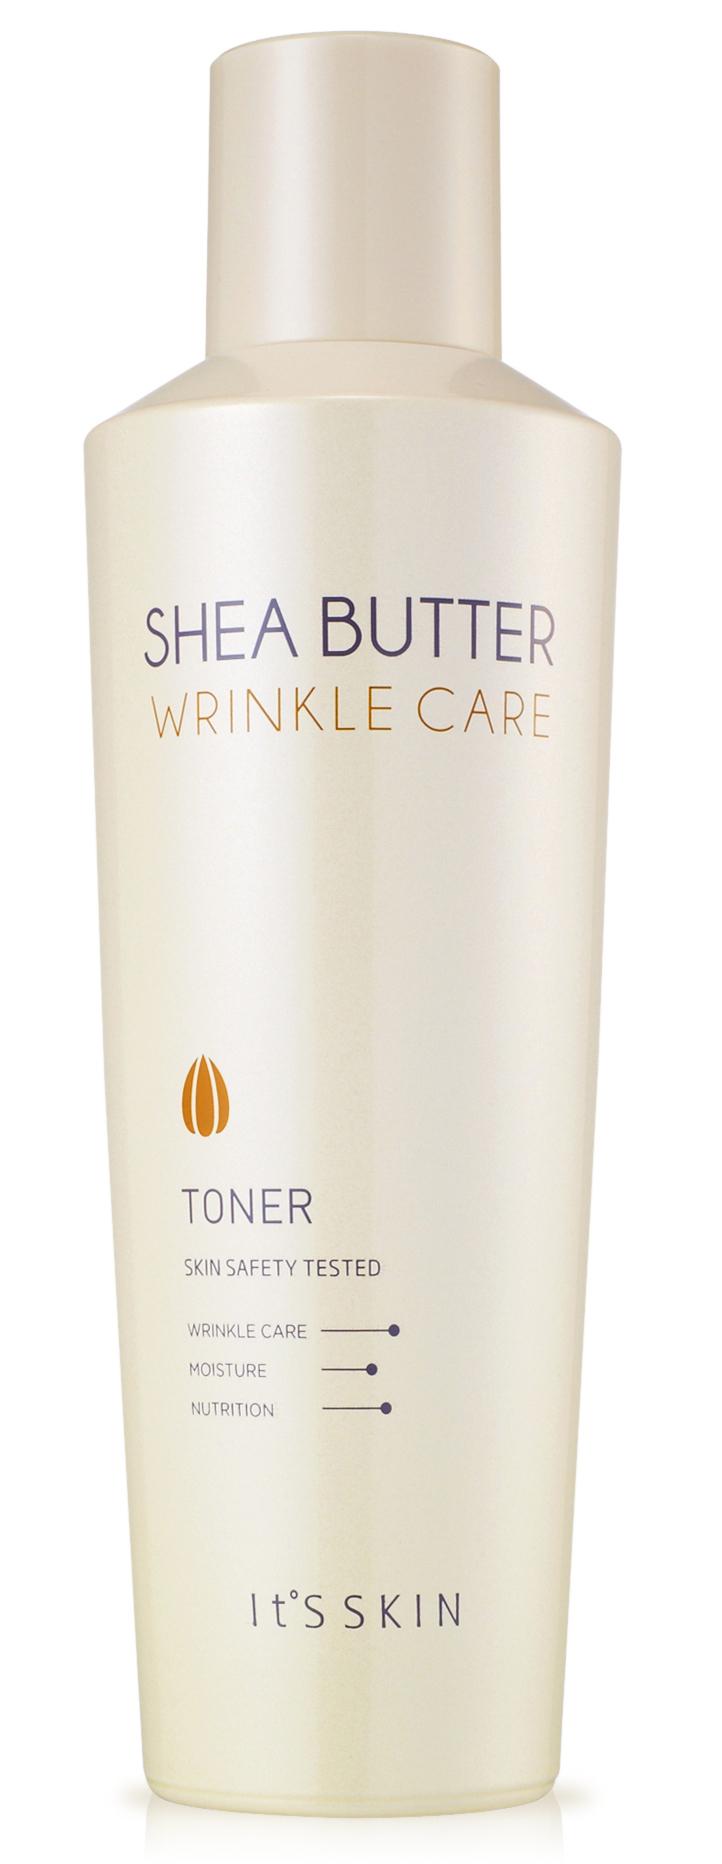 It'S SKIN Тонер антивозрастной с маслом ши / Shea Butter Wrinkle Care Toner 150 мл